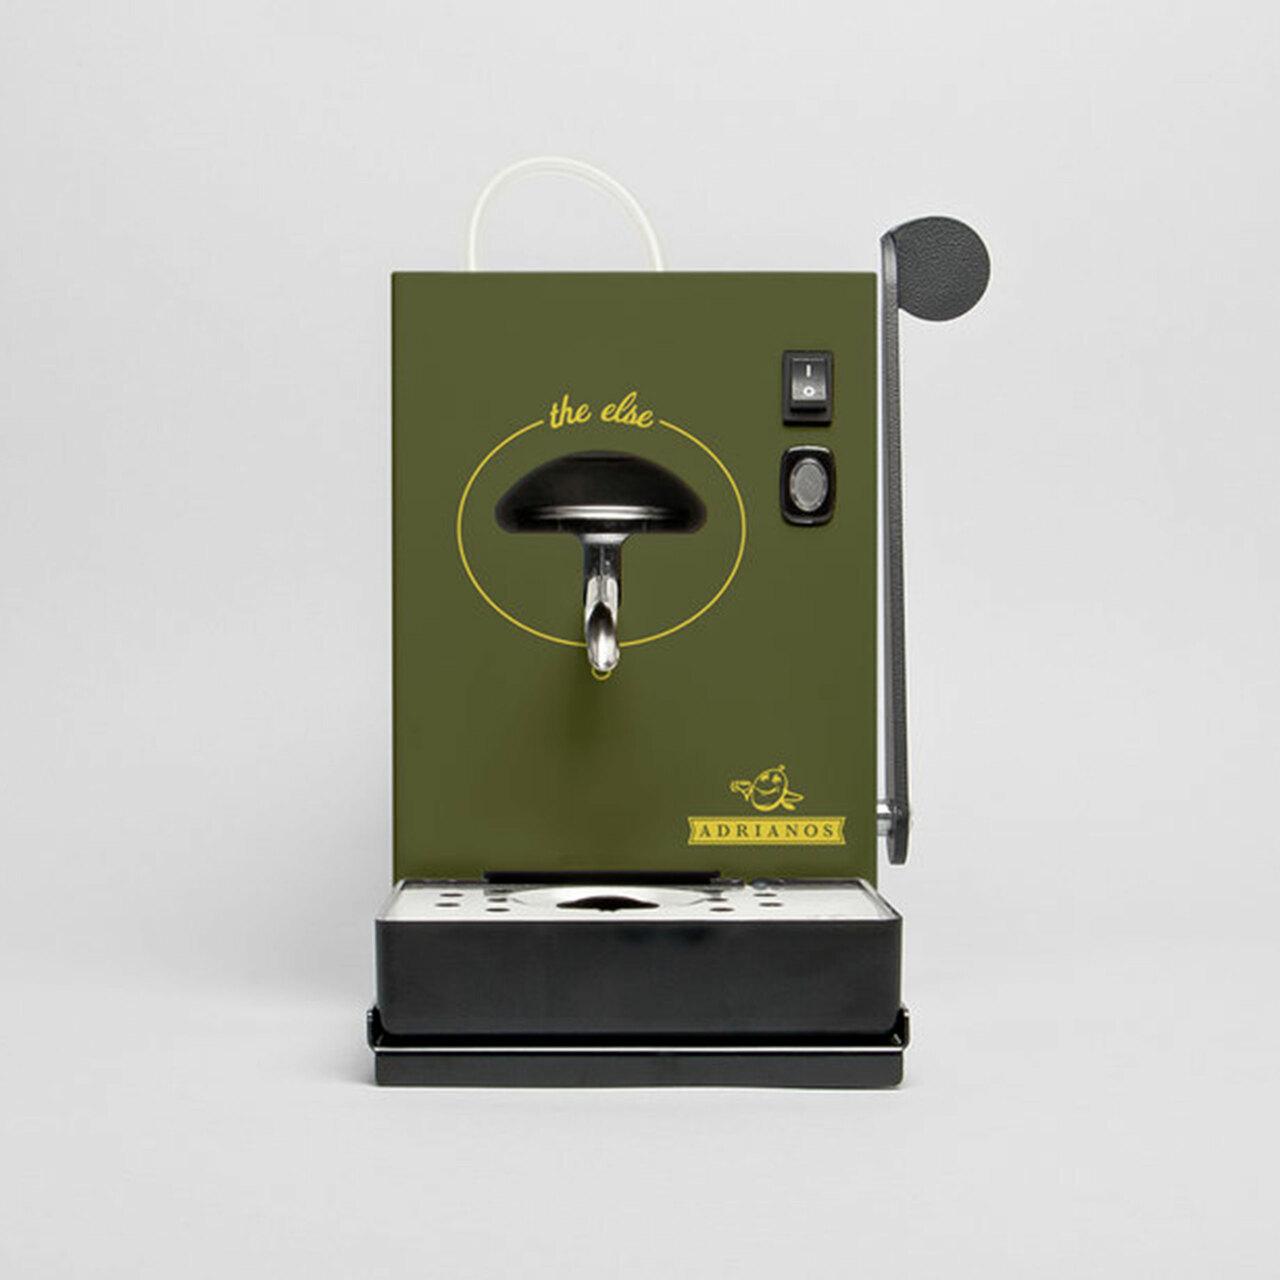 Adrianos Berner Kult-Kaffeemaschine Olive